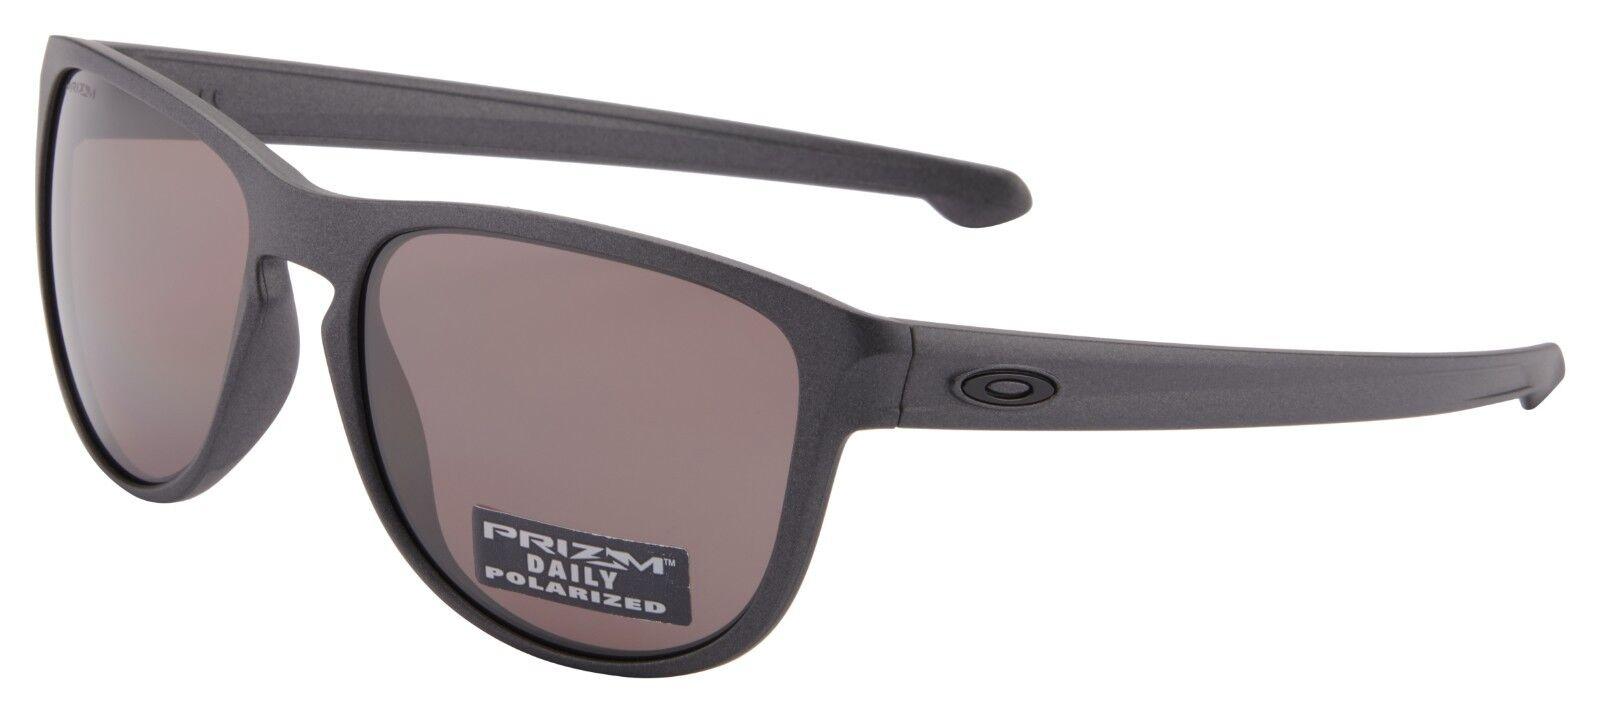 Oakley Sunglasses Sliver R Steel Prizm Daily Polarized Oo9342-08 for ... 3e50ae0c3a